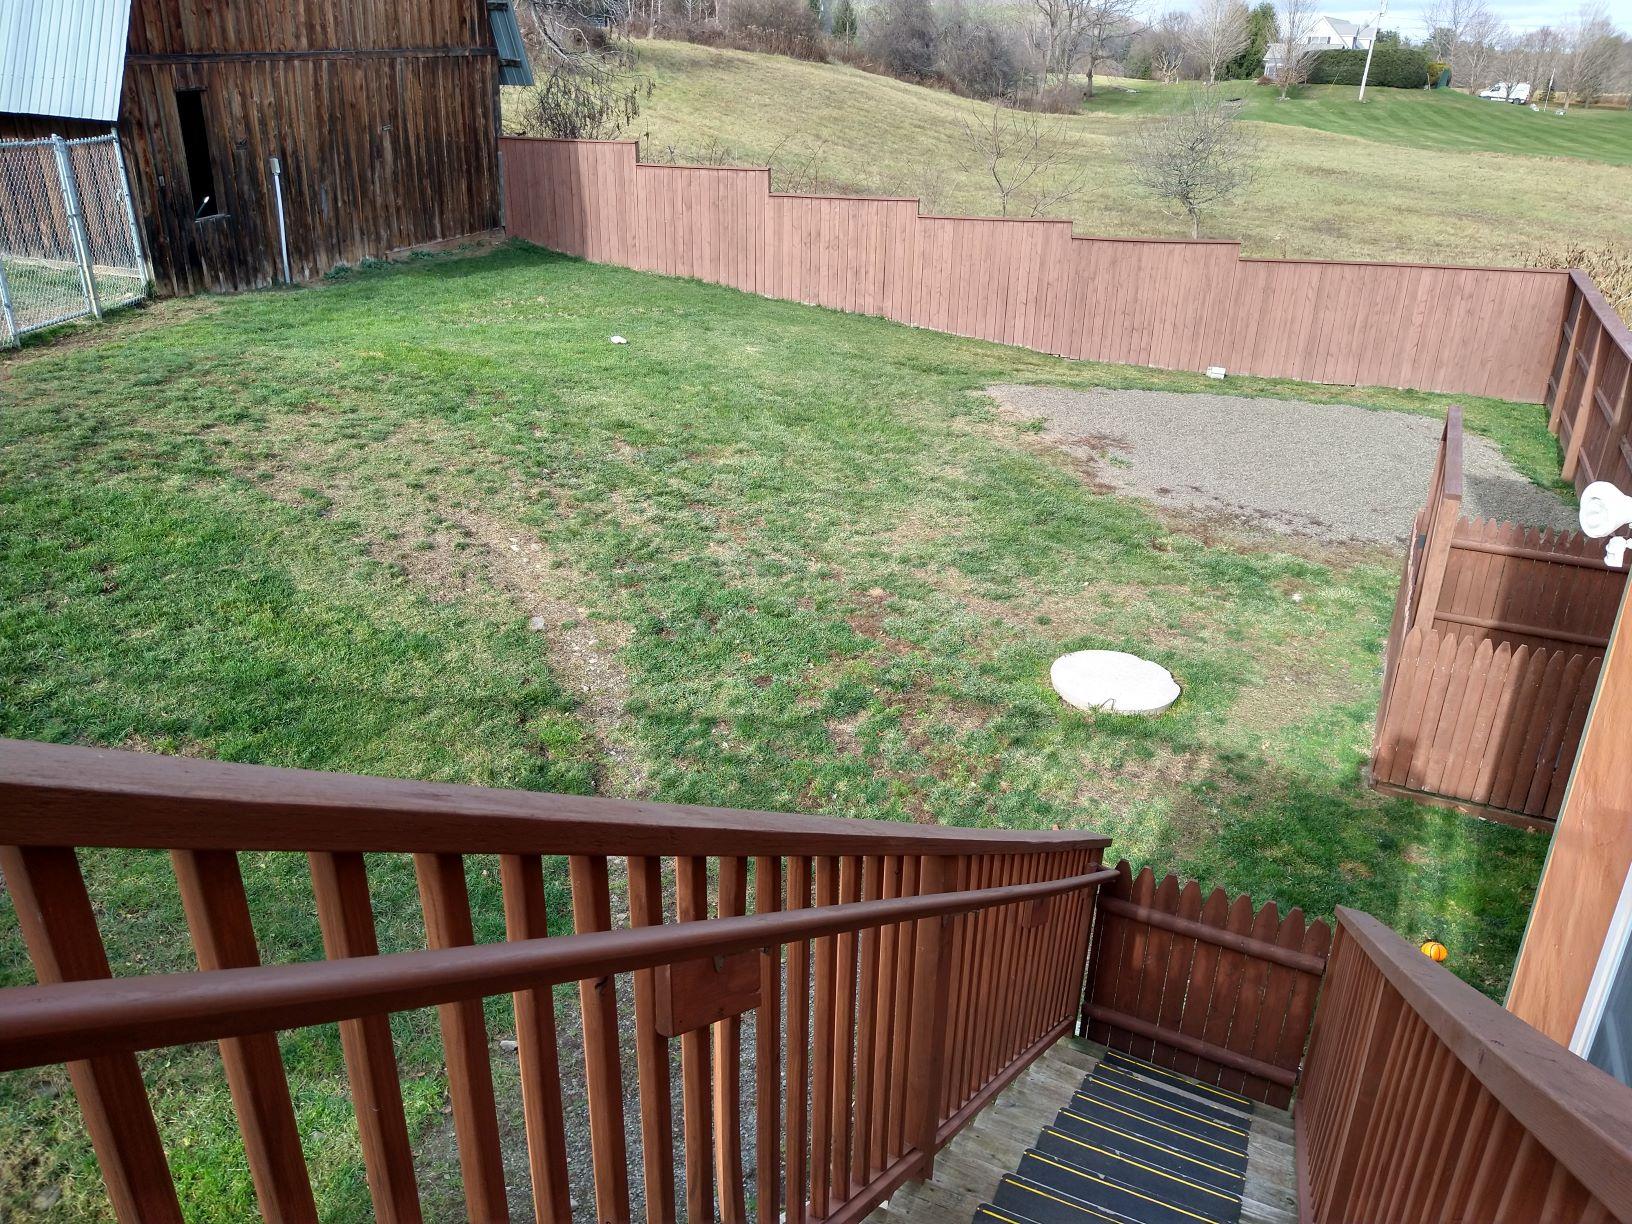 Yard behind the house